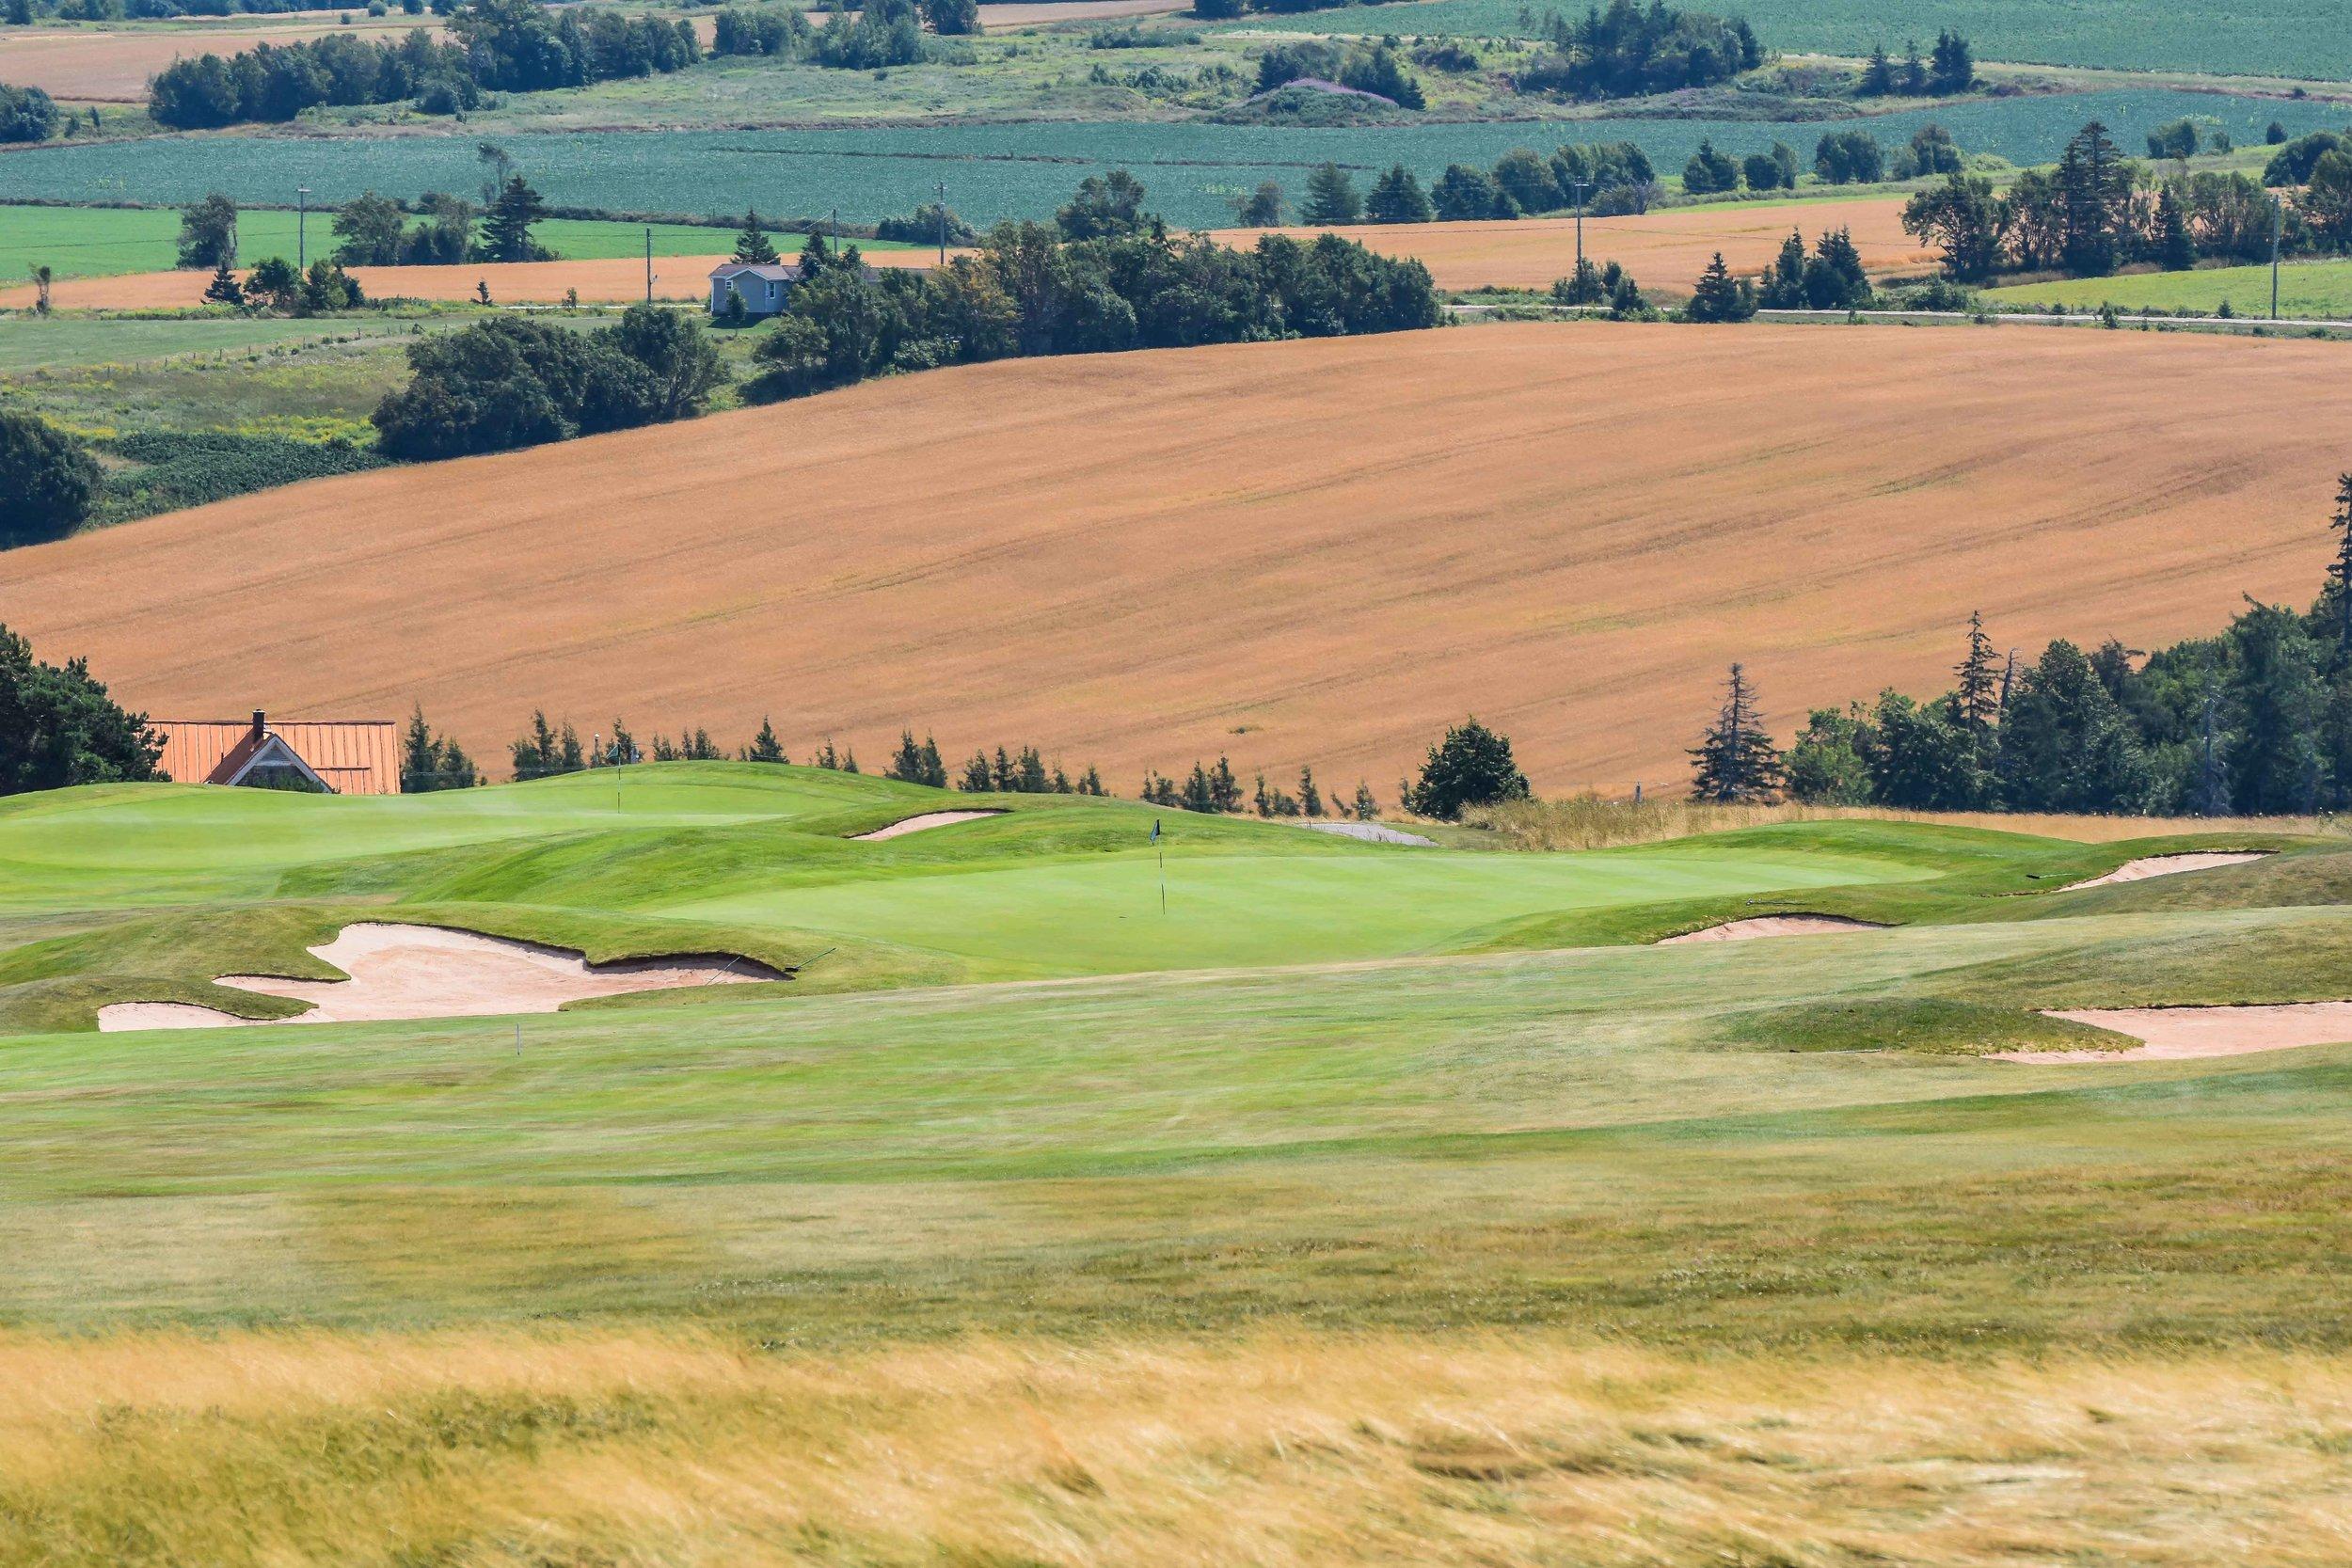 The 2nd hole at Glasgow Hills Golf Club